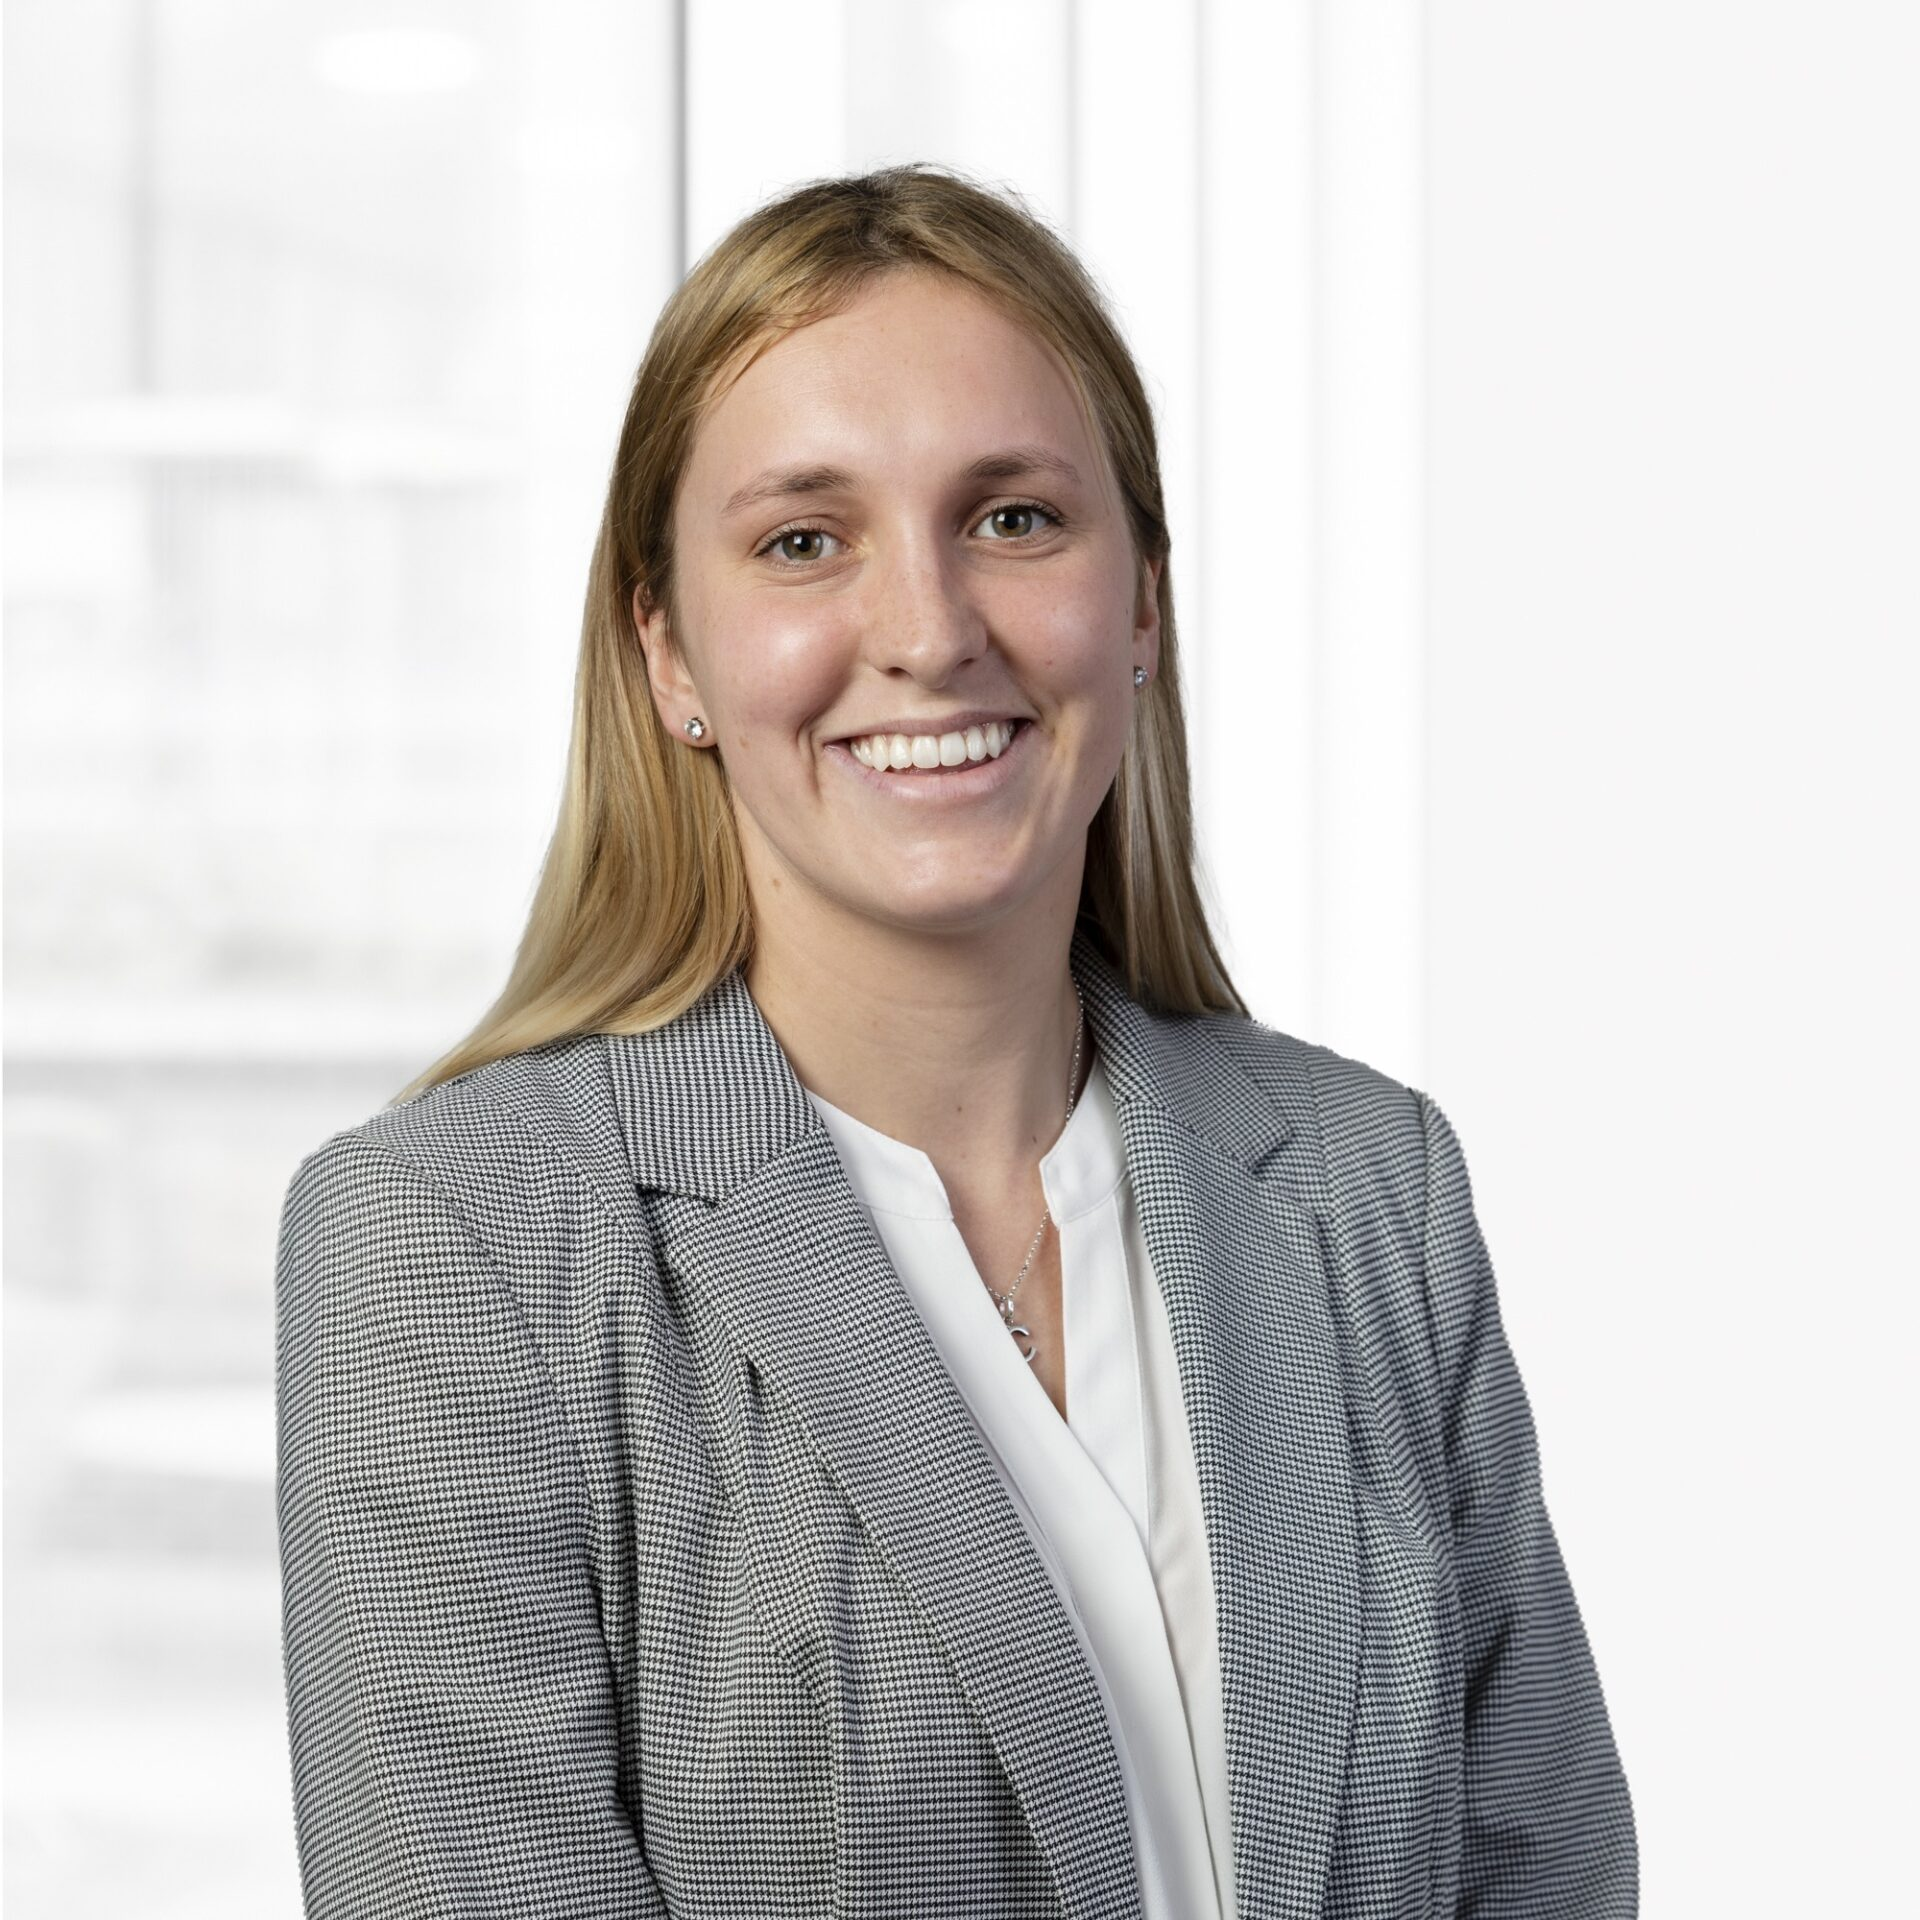 Photo of Charlotte Cockerill